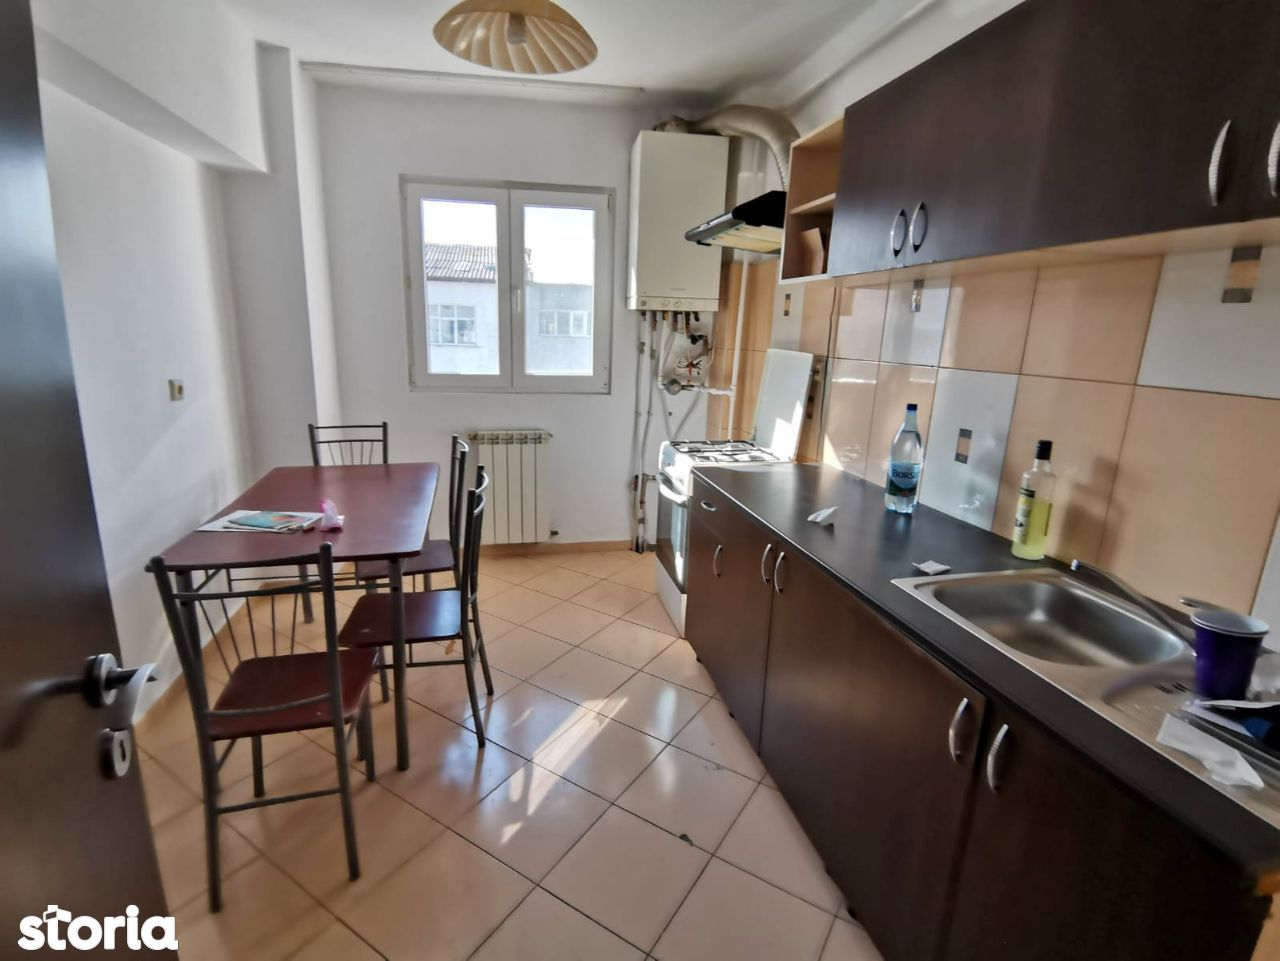 Apartament 2 camere, bloc din anii '80, bucatarie mare, zona Miorita